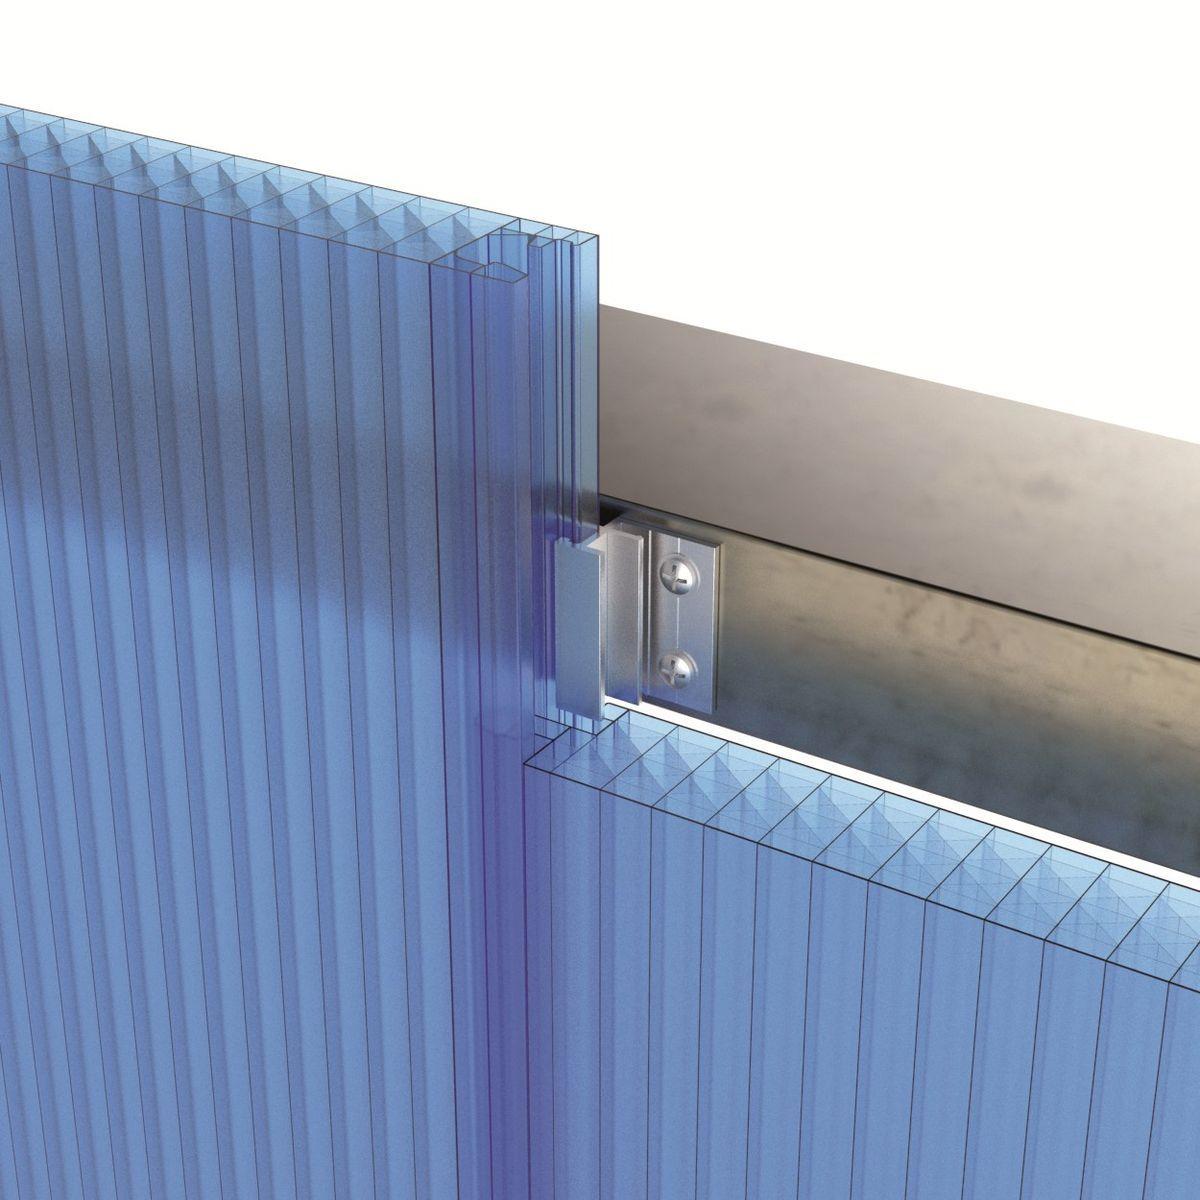 Interlocking Polycarbonate System For Traslucent Facades